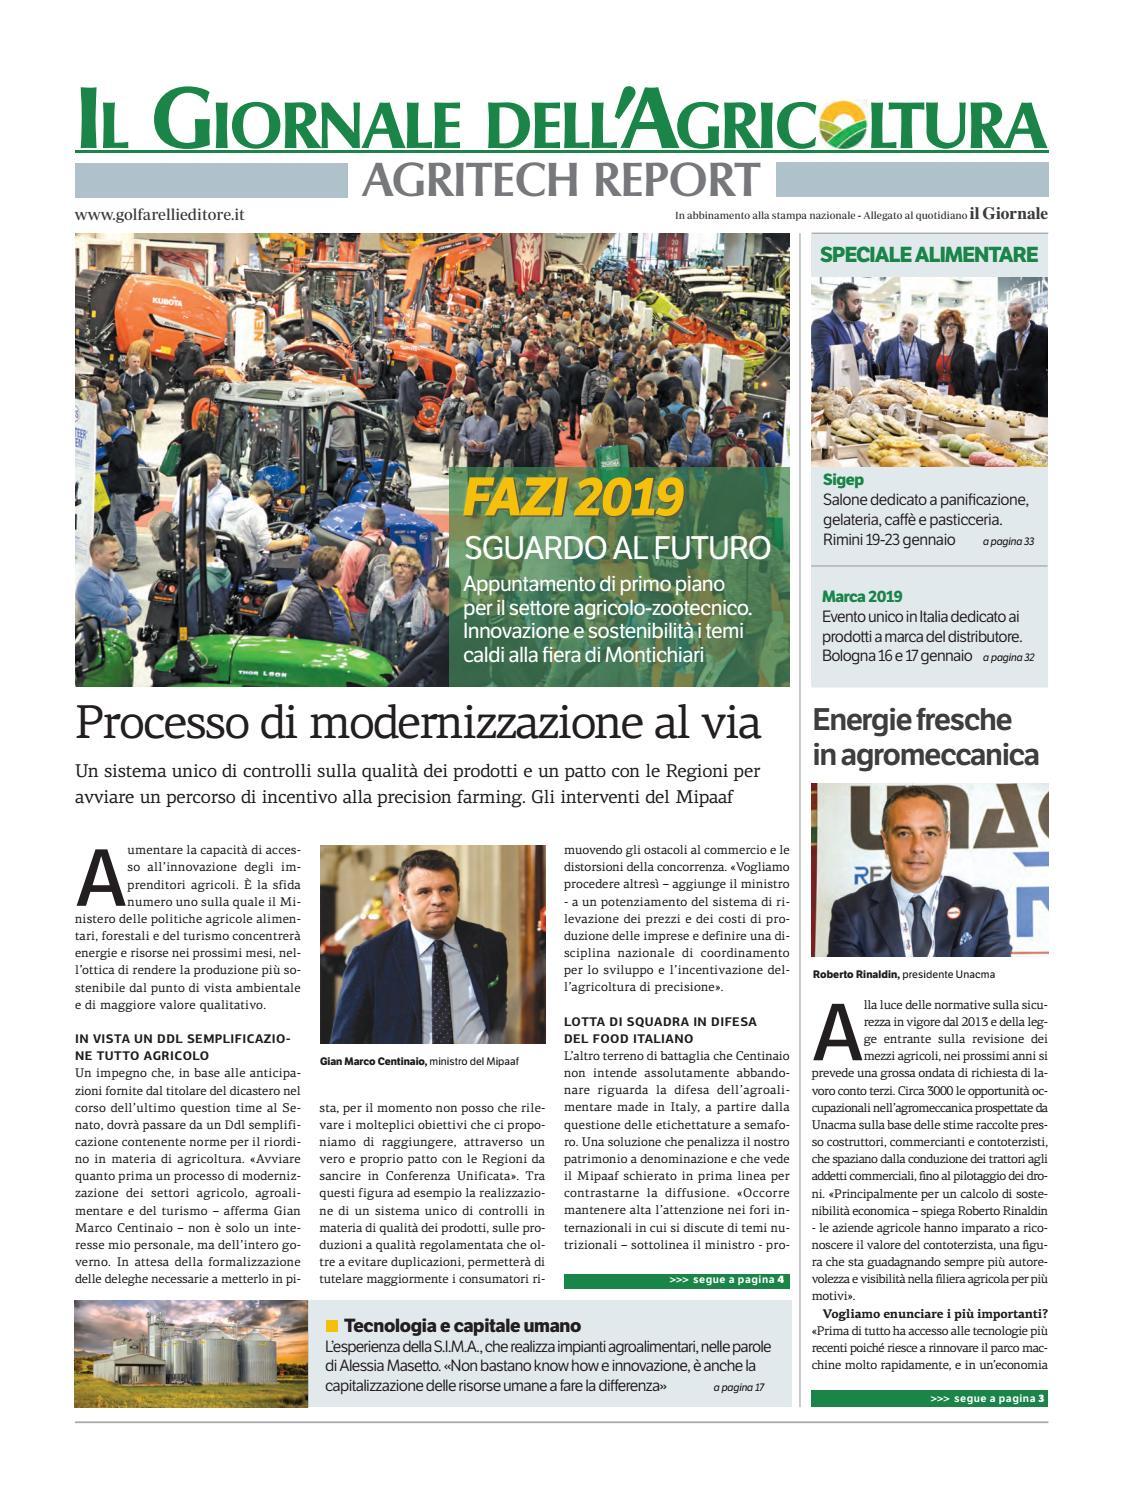 Giornale Agricoltura Dic 18 by Golfarelli Editore International Group -  issuu 13891f8ad2398